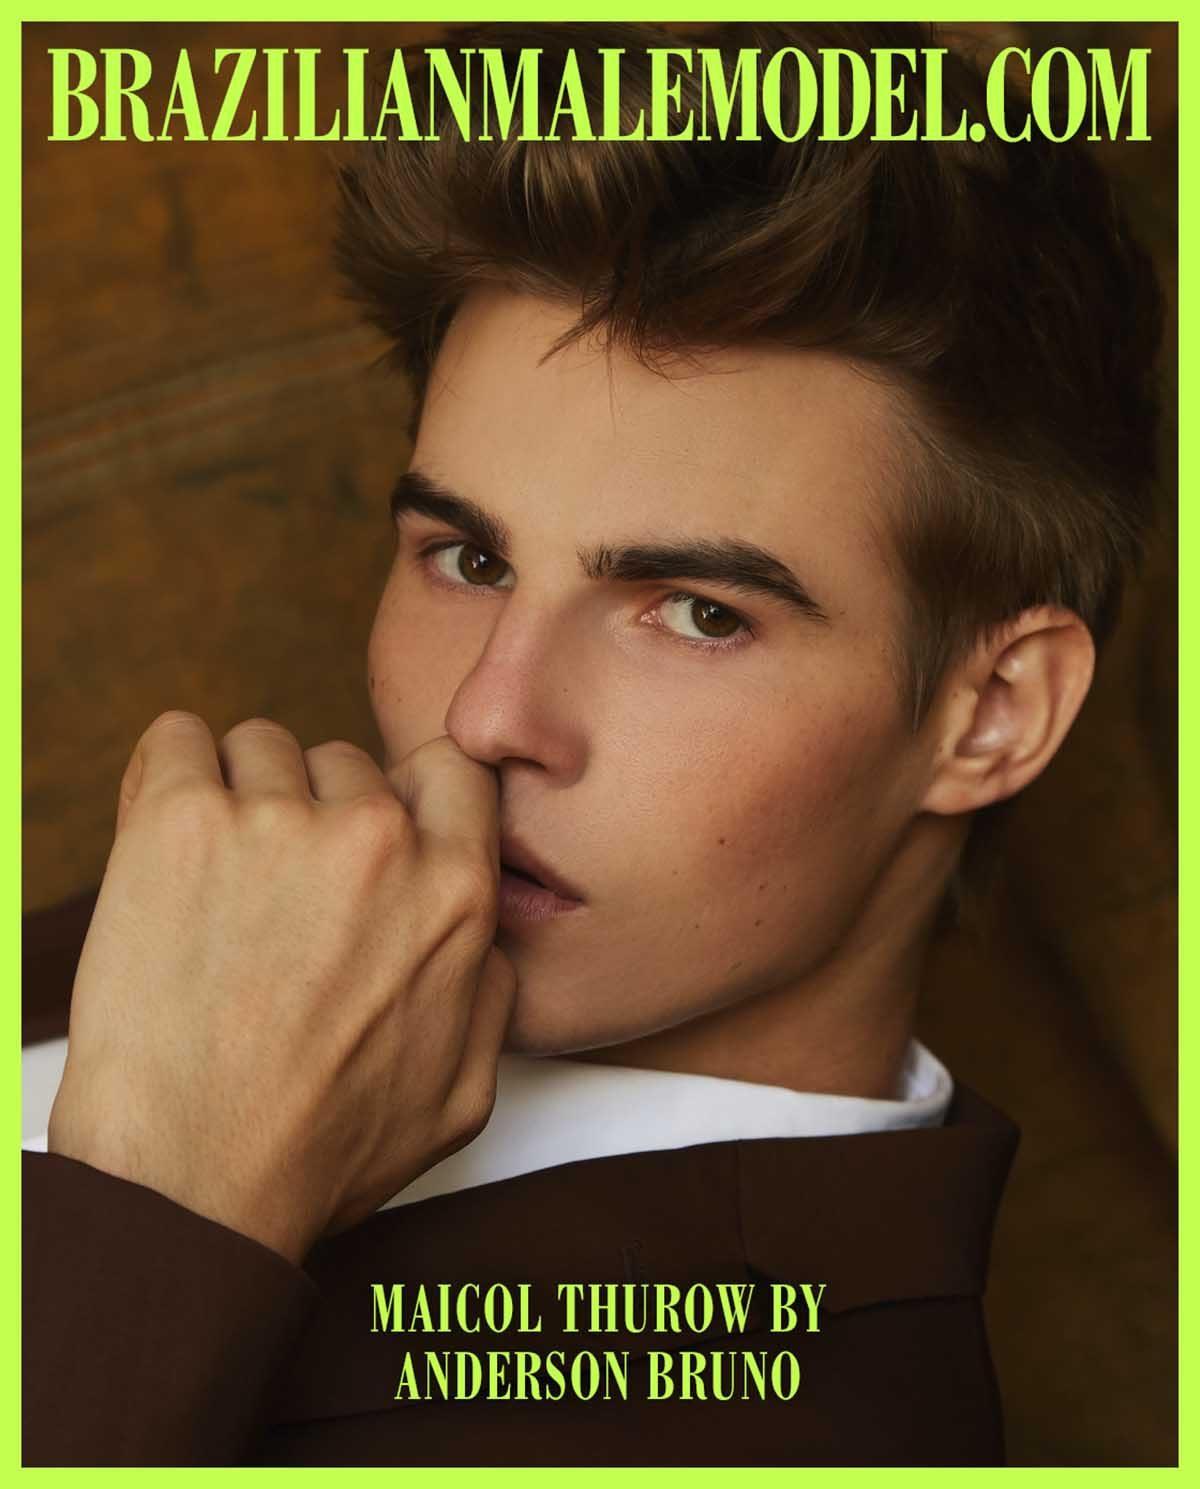 Maicol Thurow by Anderson Bruno